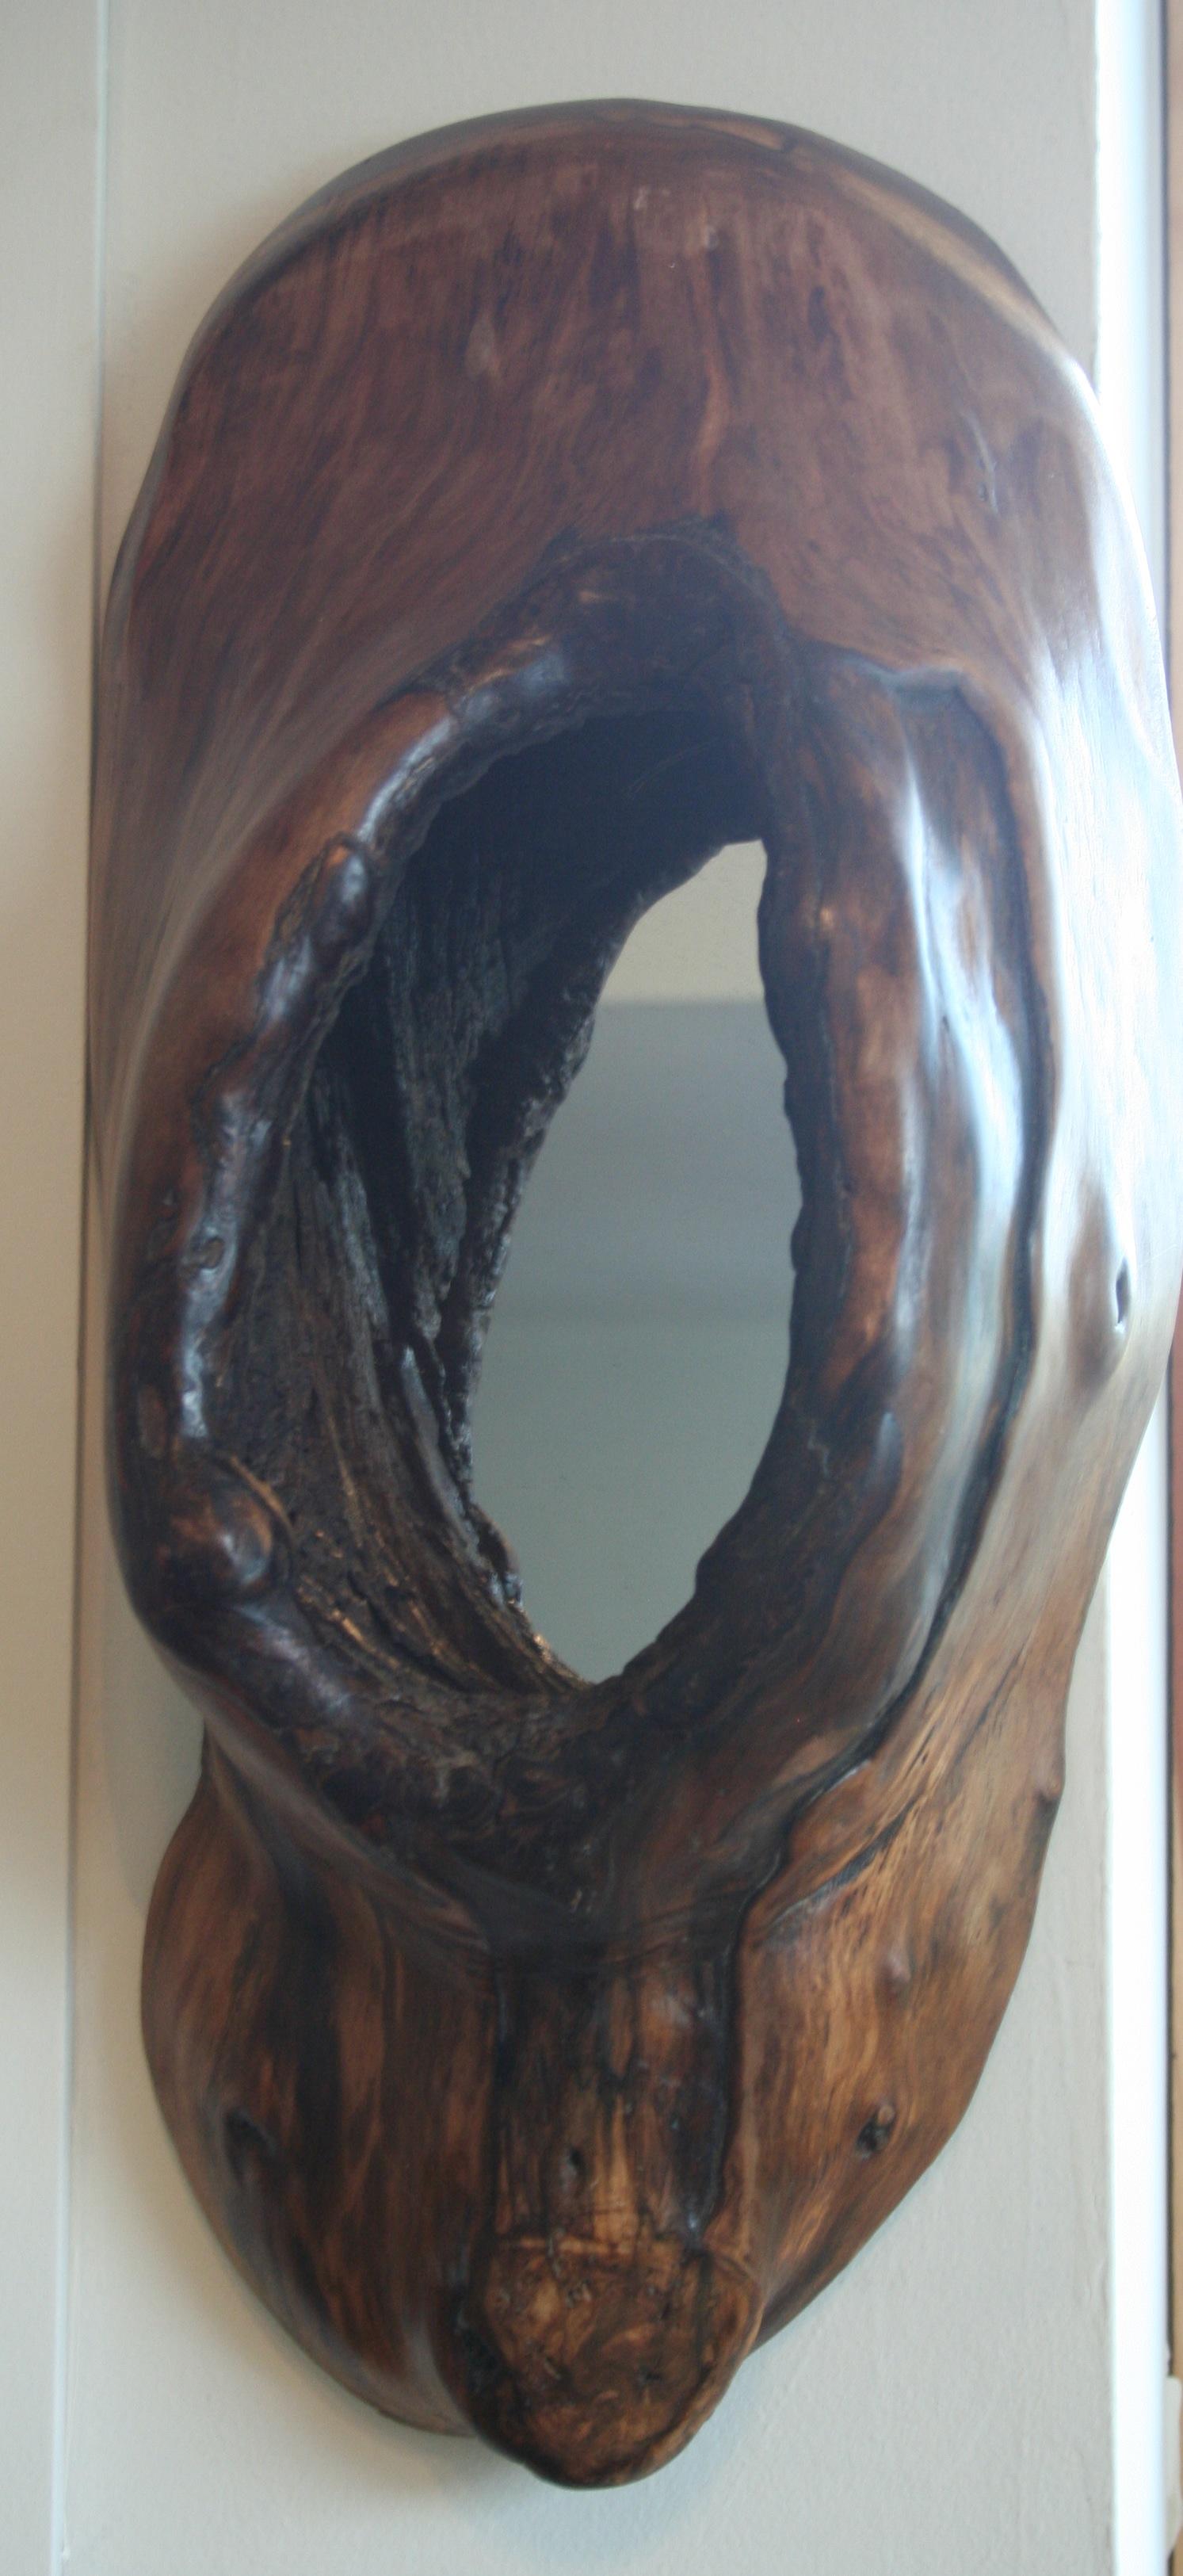 Knothole mirror